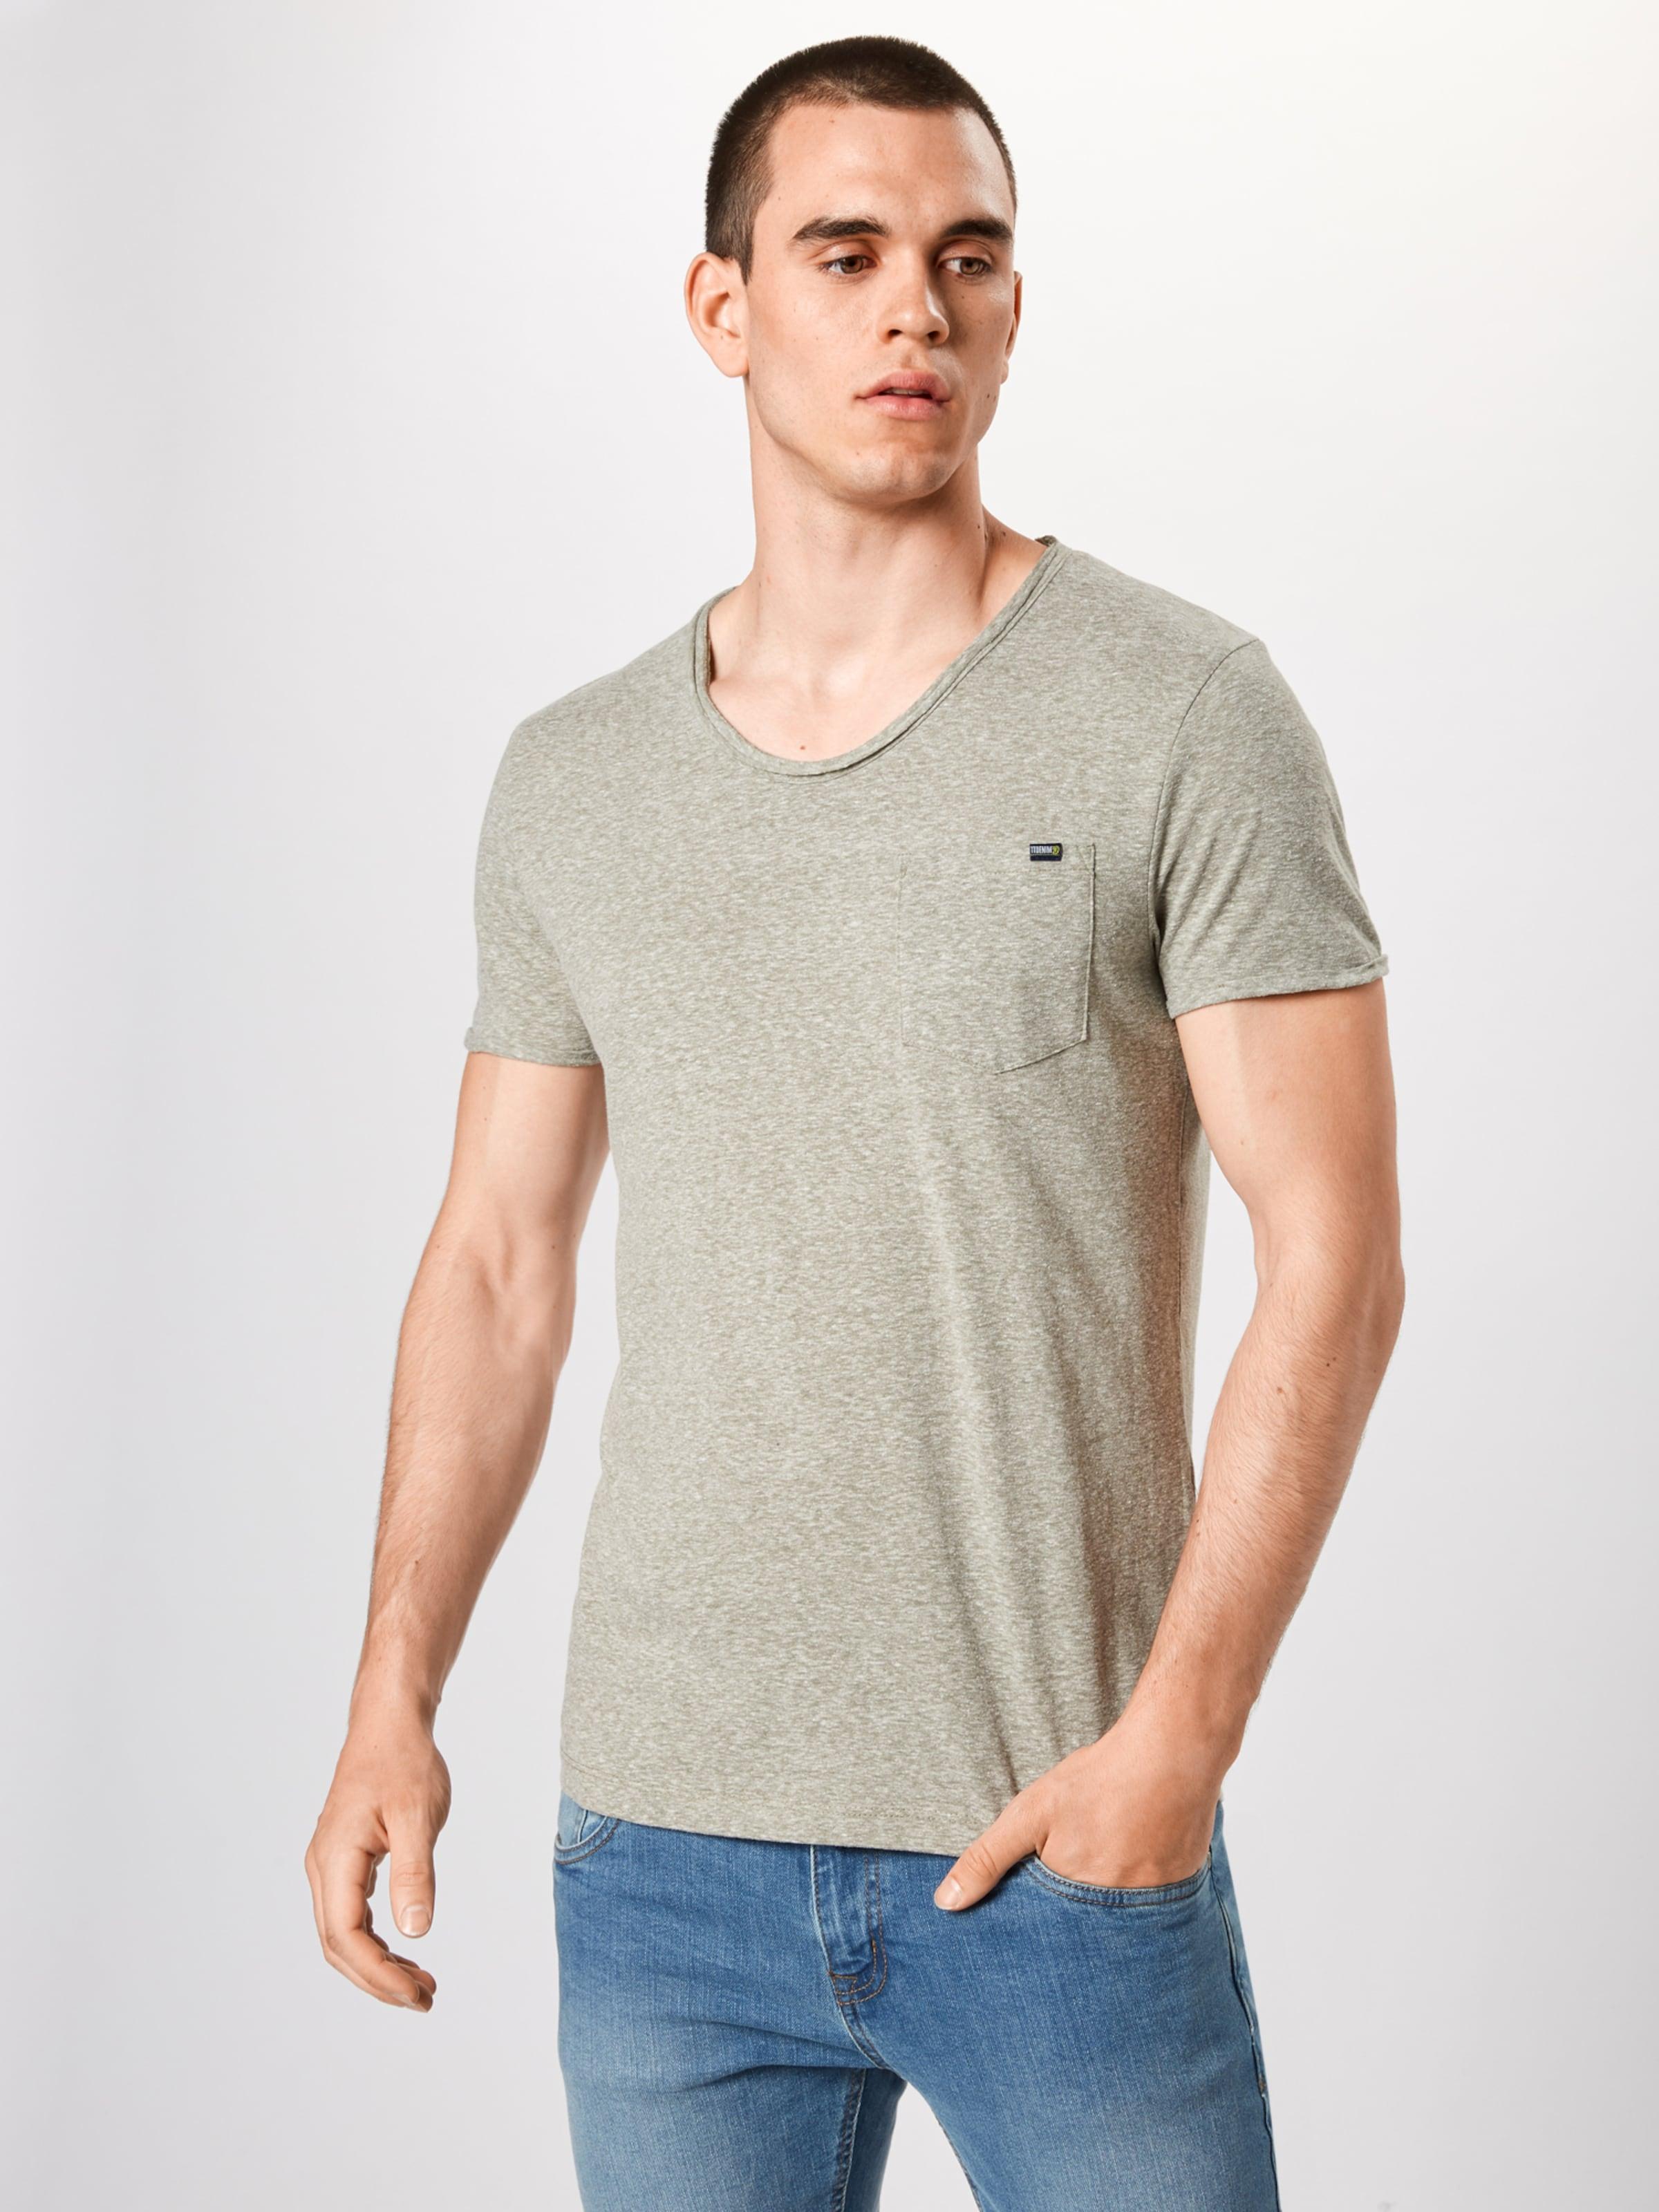 Tom Tailor T shirt In Denim Khaki QxoedCBWr